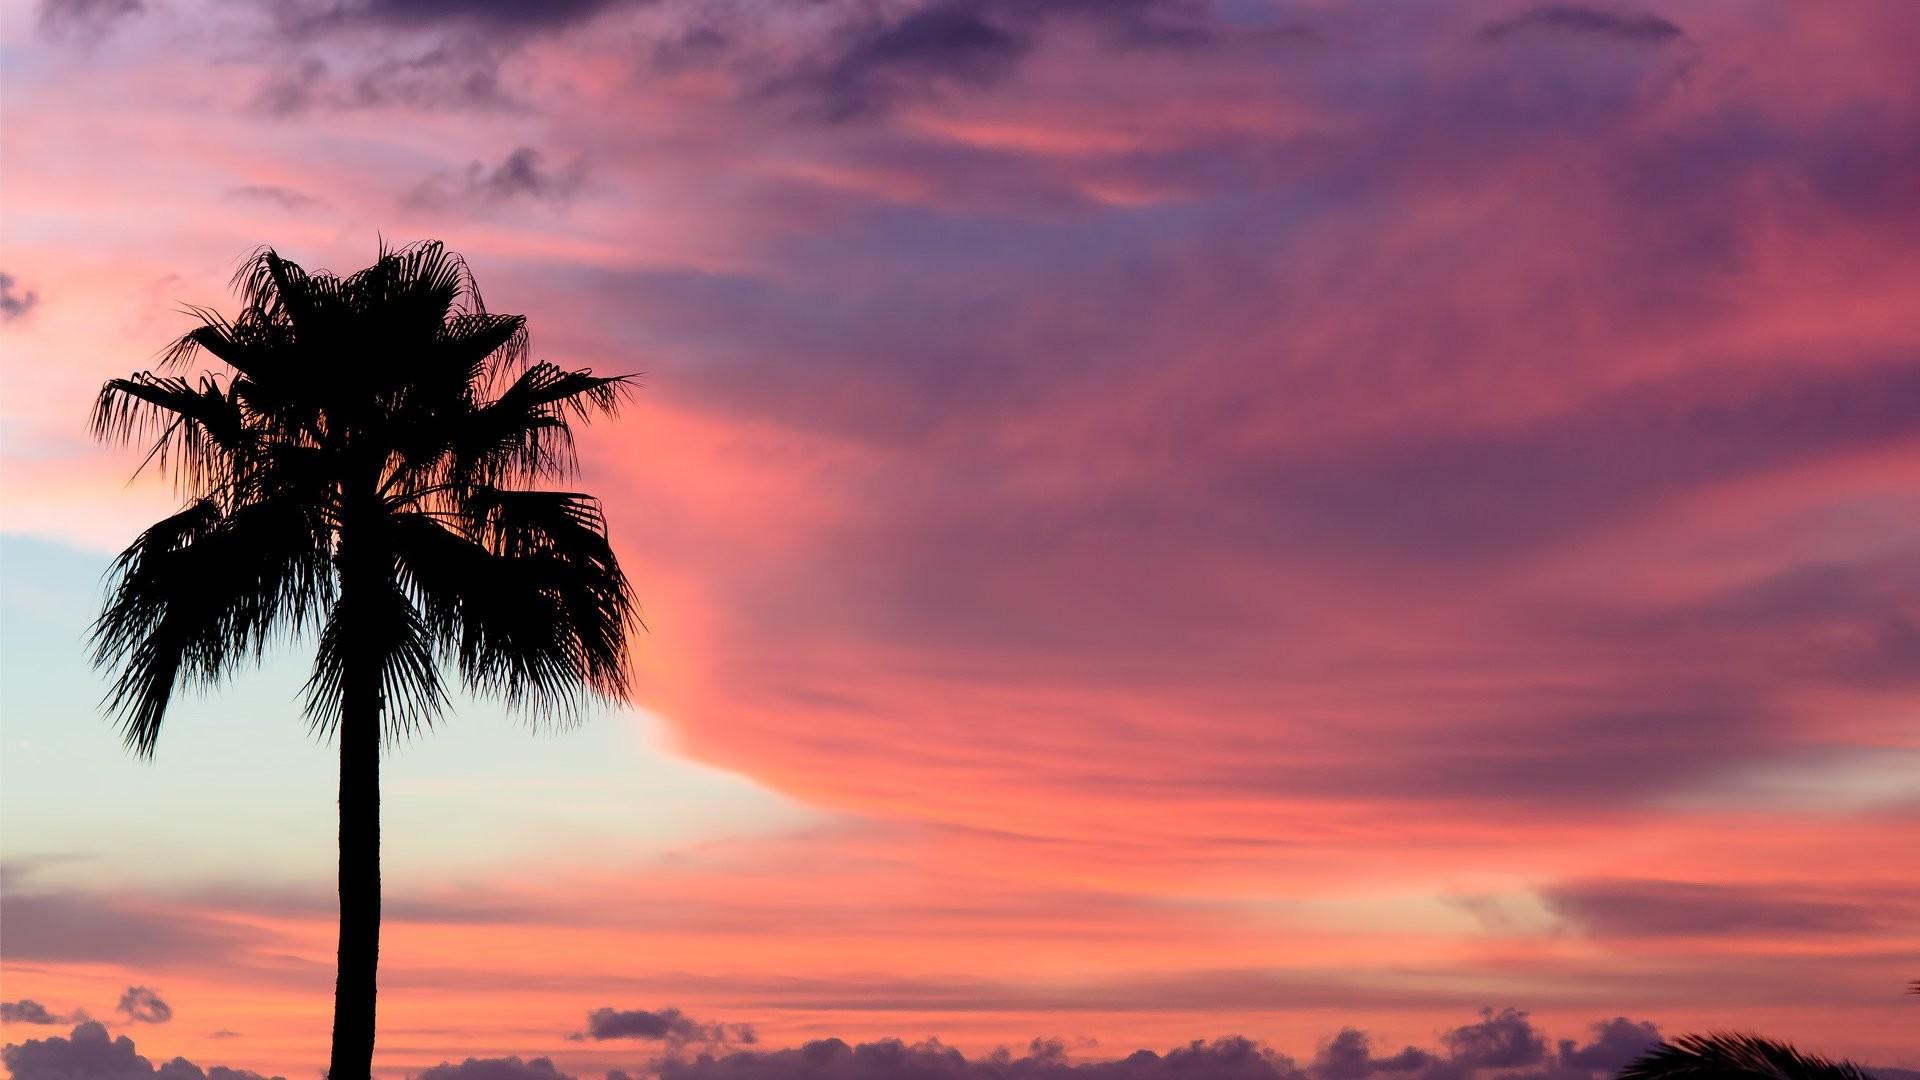 Palm tree desktop wallpaper 72 images - Free palm tree screensavers ...